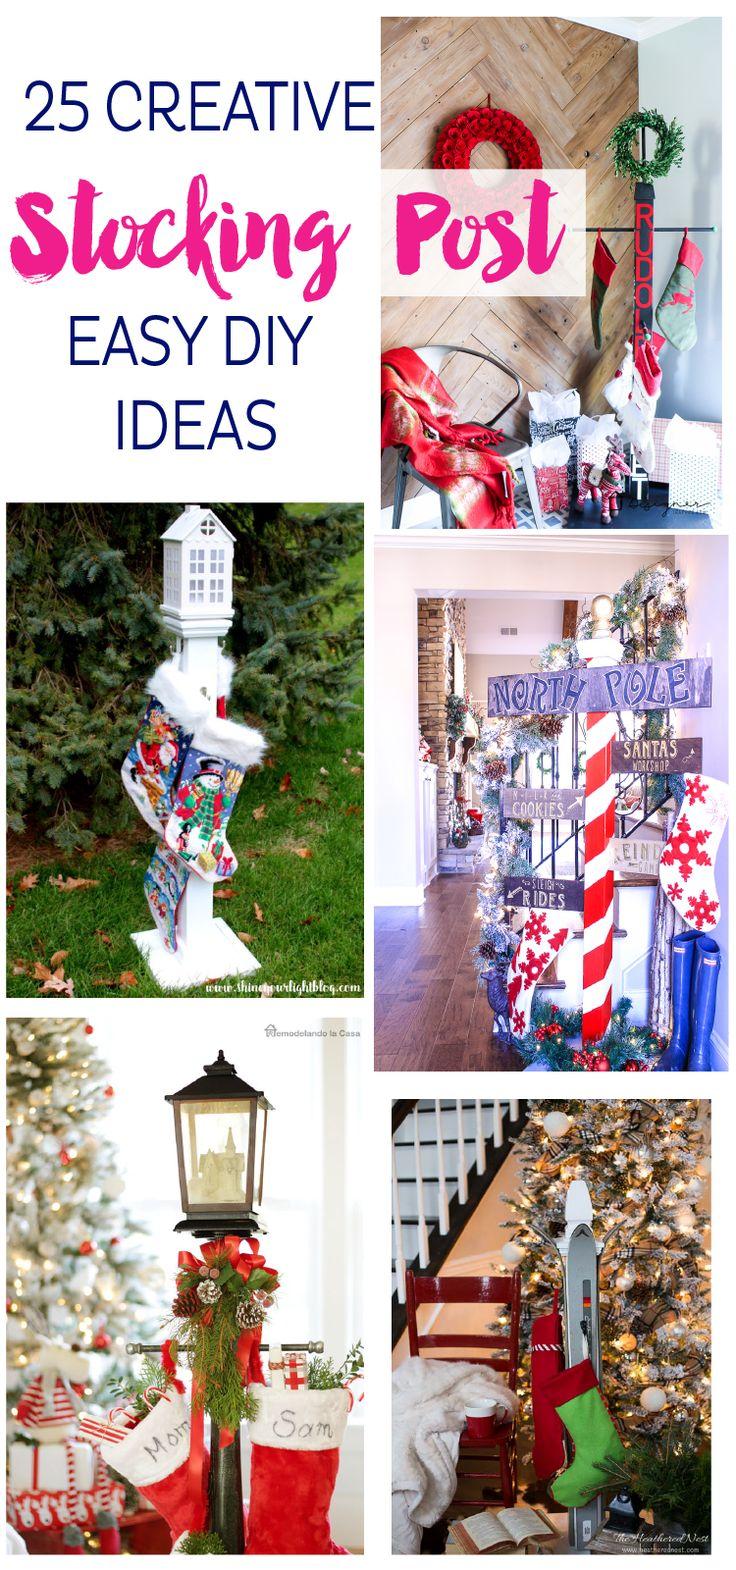 diy-stocking-post-ideas